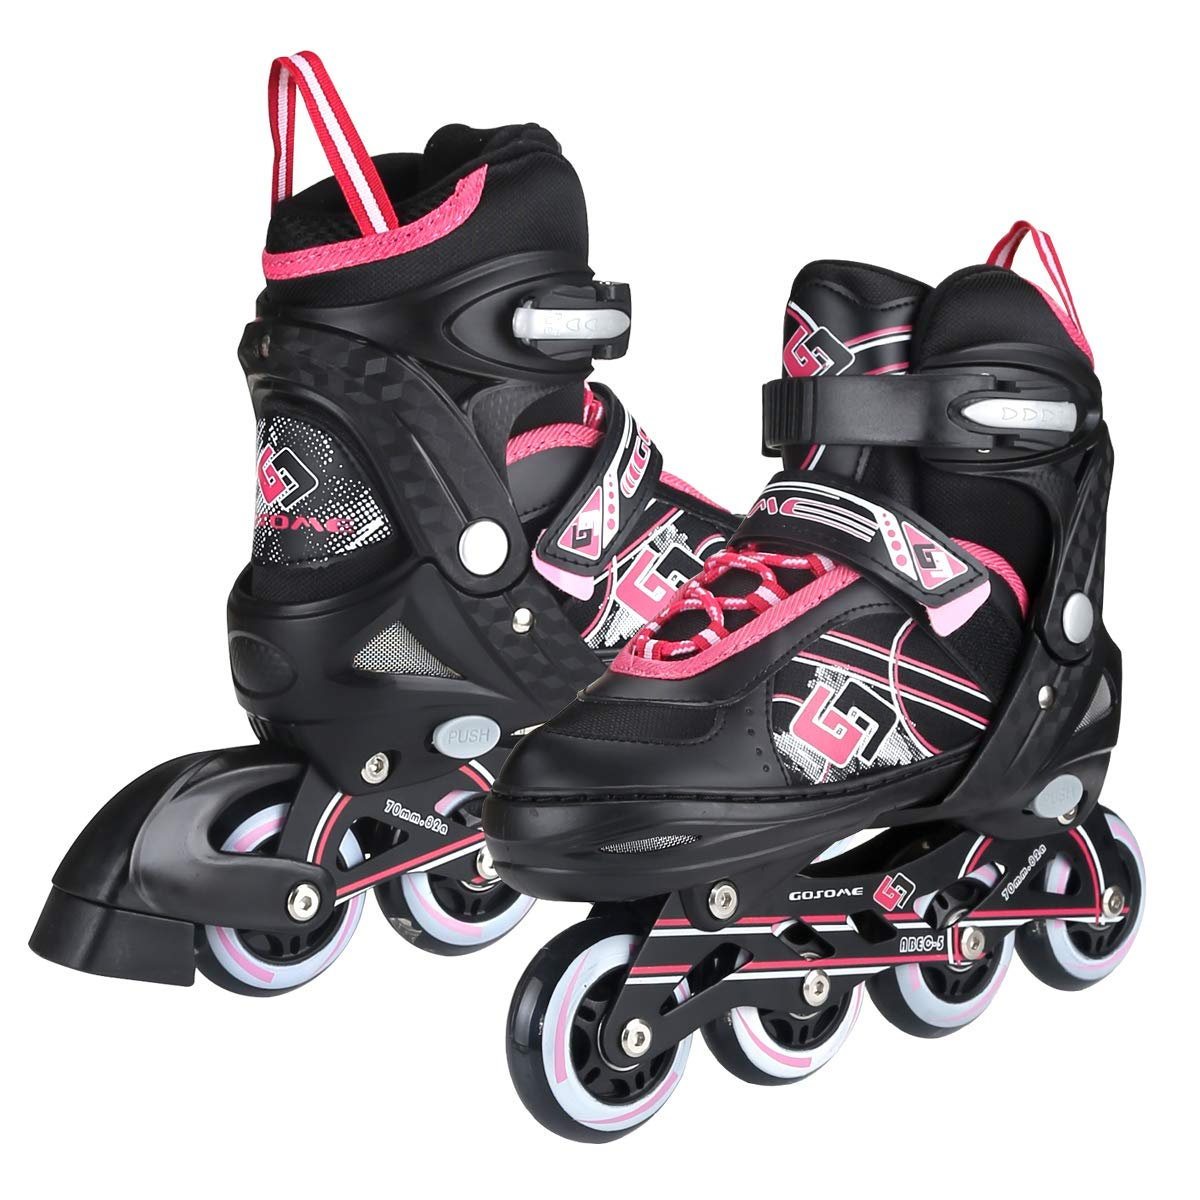 ZALALOVA Inline Skate for Girls, Kids Adjustable Inline Skates Safe Girls Roller Skates with Thickened Breathable Mesh Rollerblades for Girls Boys Beginner – Featuring All Illuminating Wheels